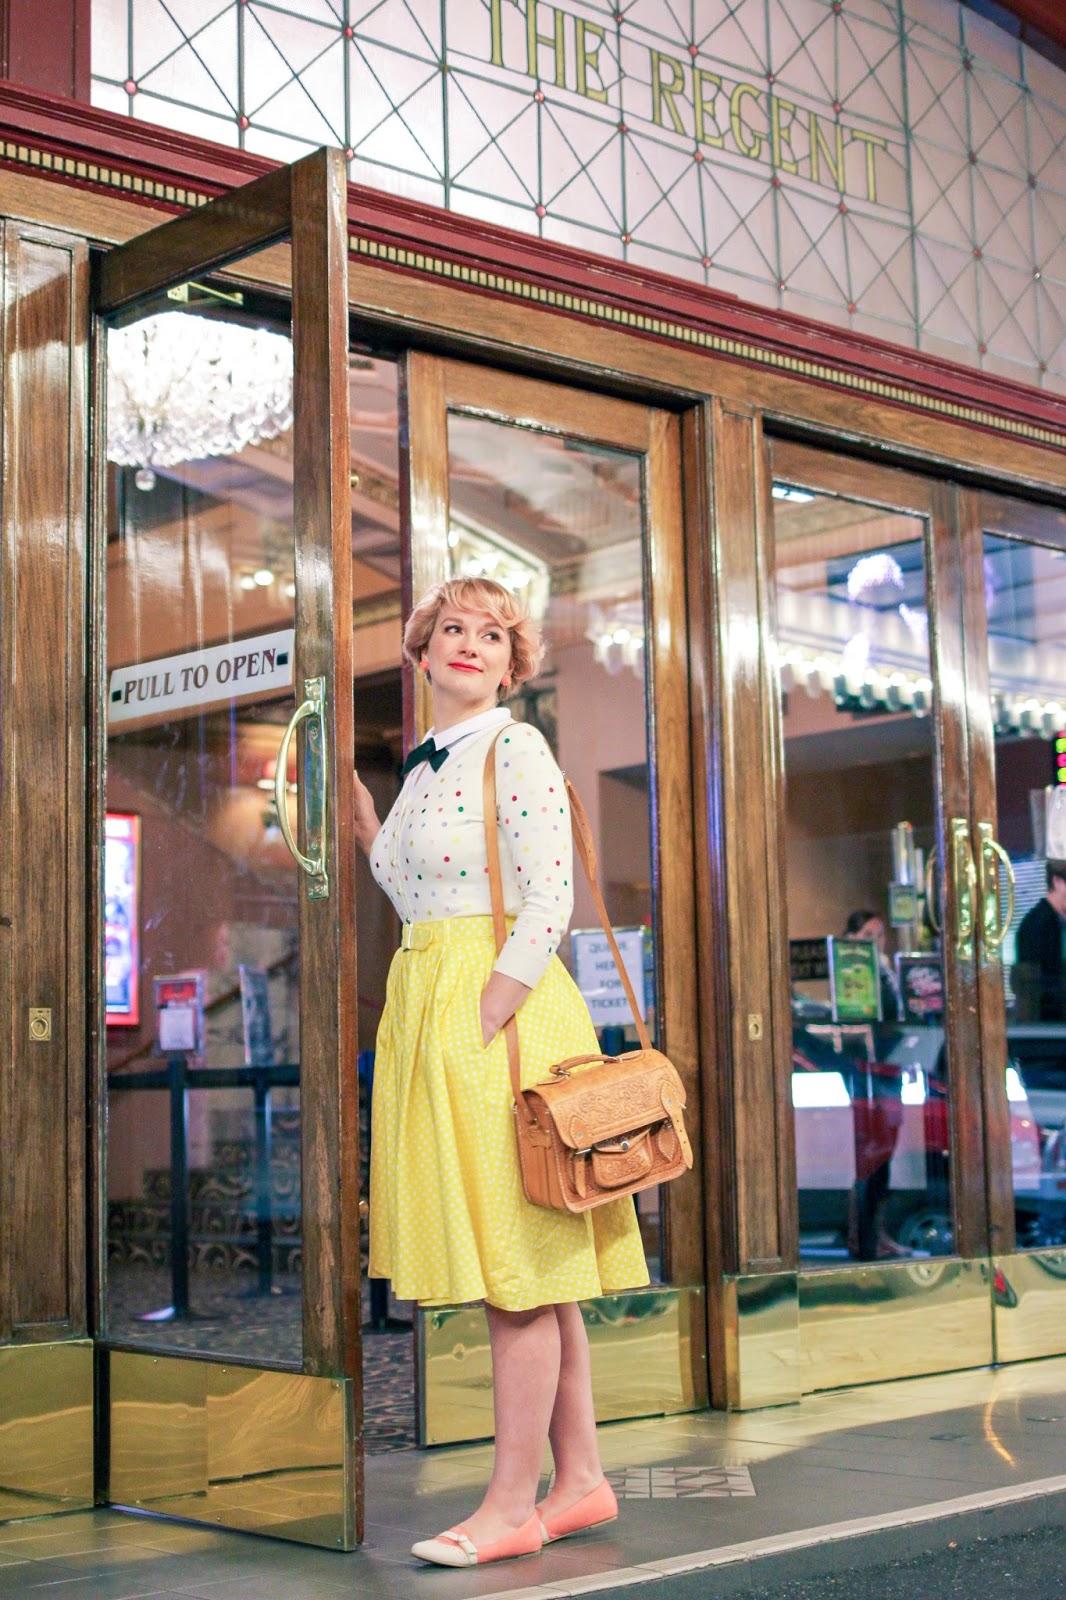 Liana of Finding Femme visits Regent Multiplex Cinema Ballarat wearing an embroidered Alannah Hill cardigan and yellow Modcloth skirt.